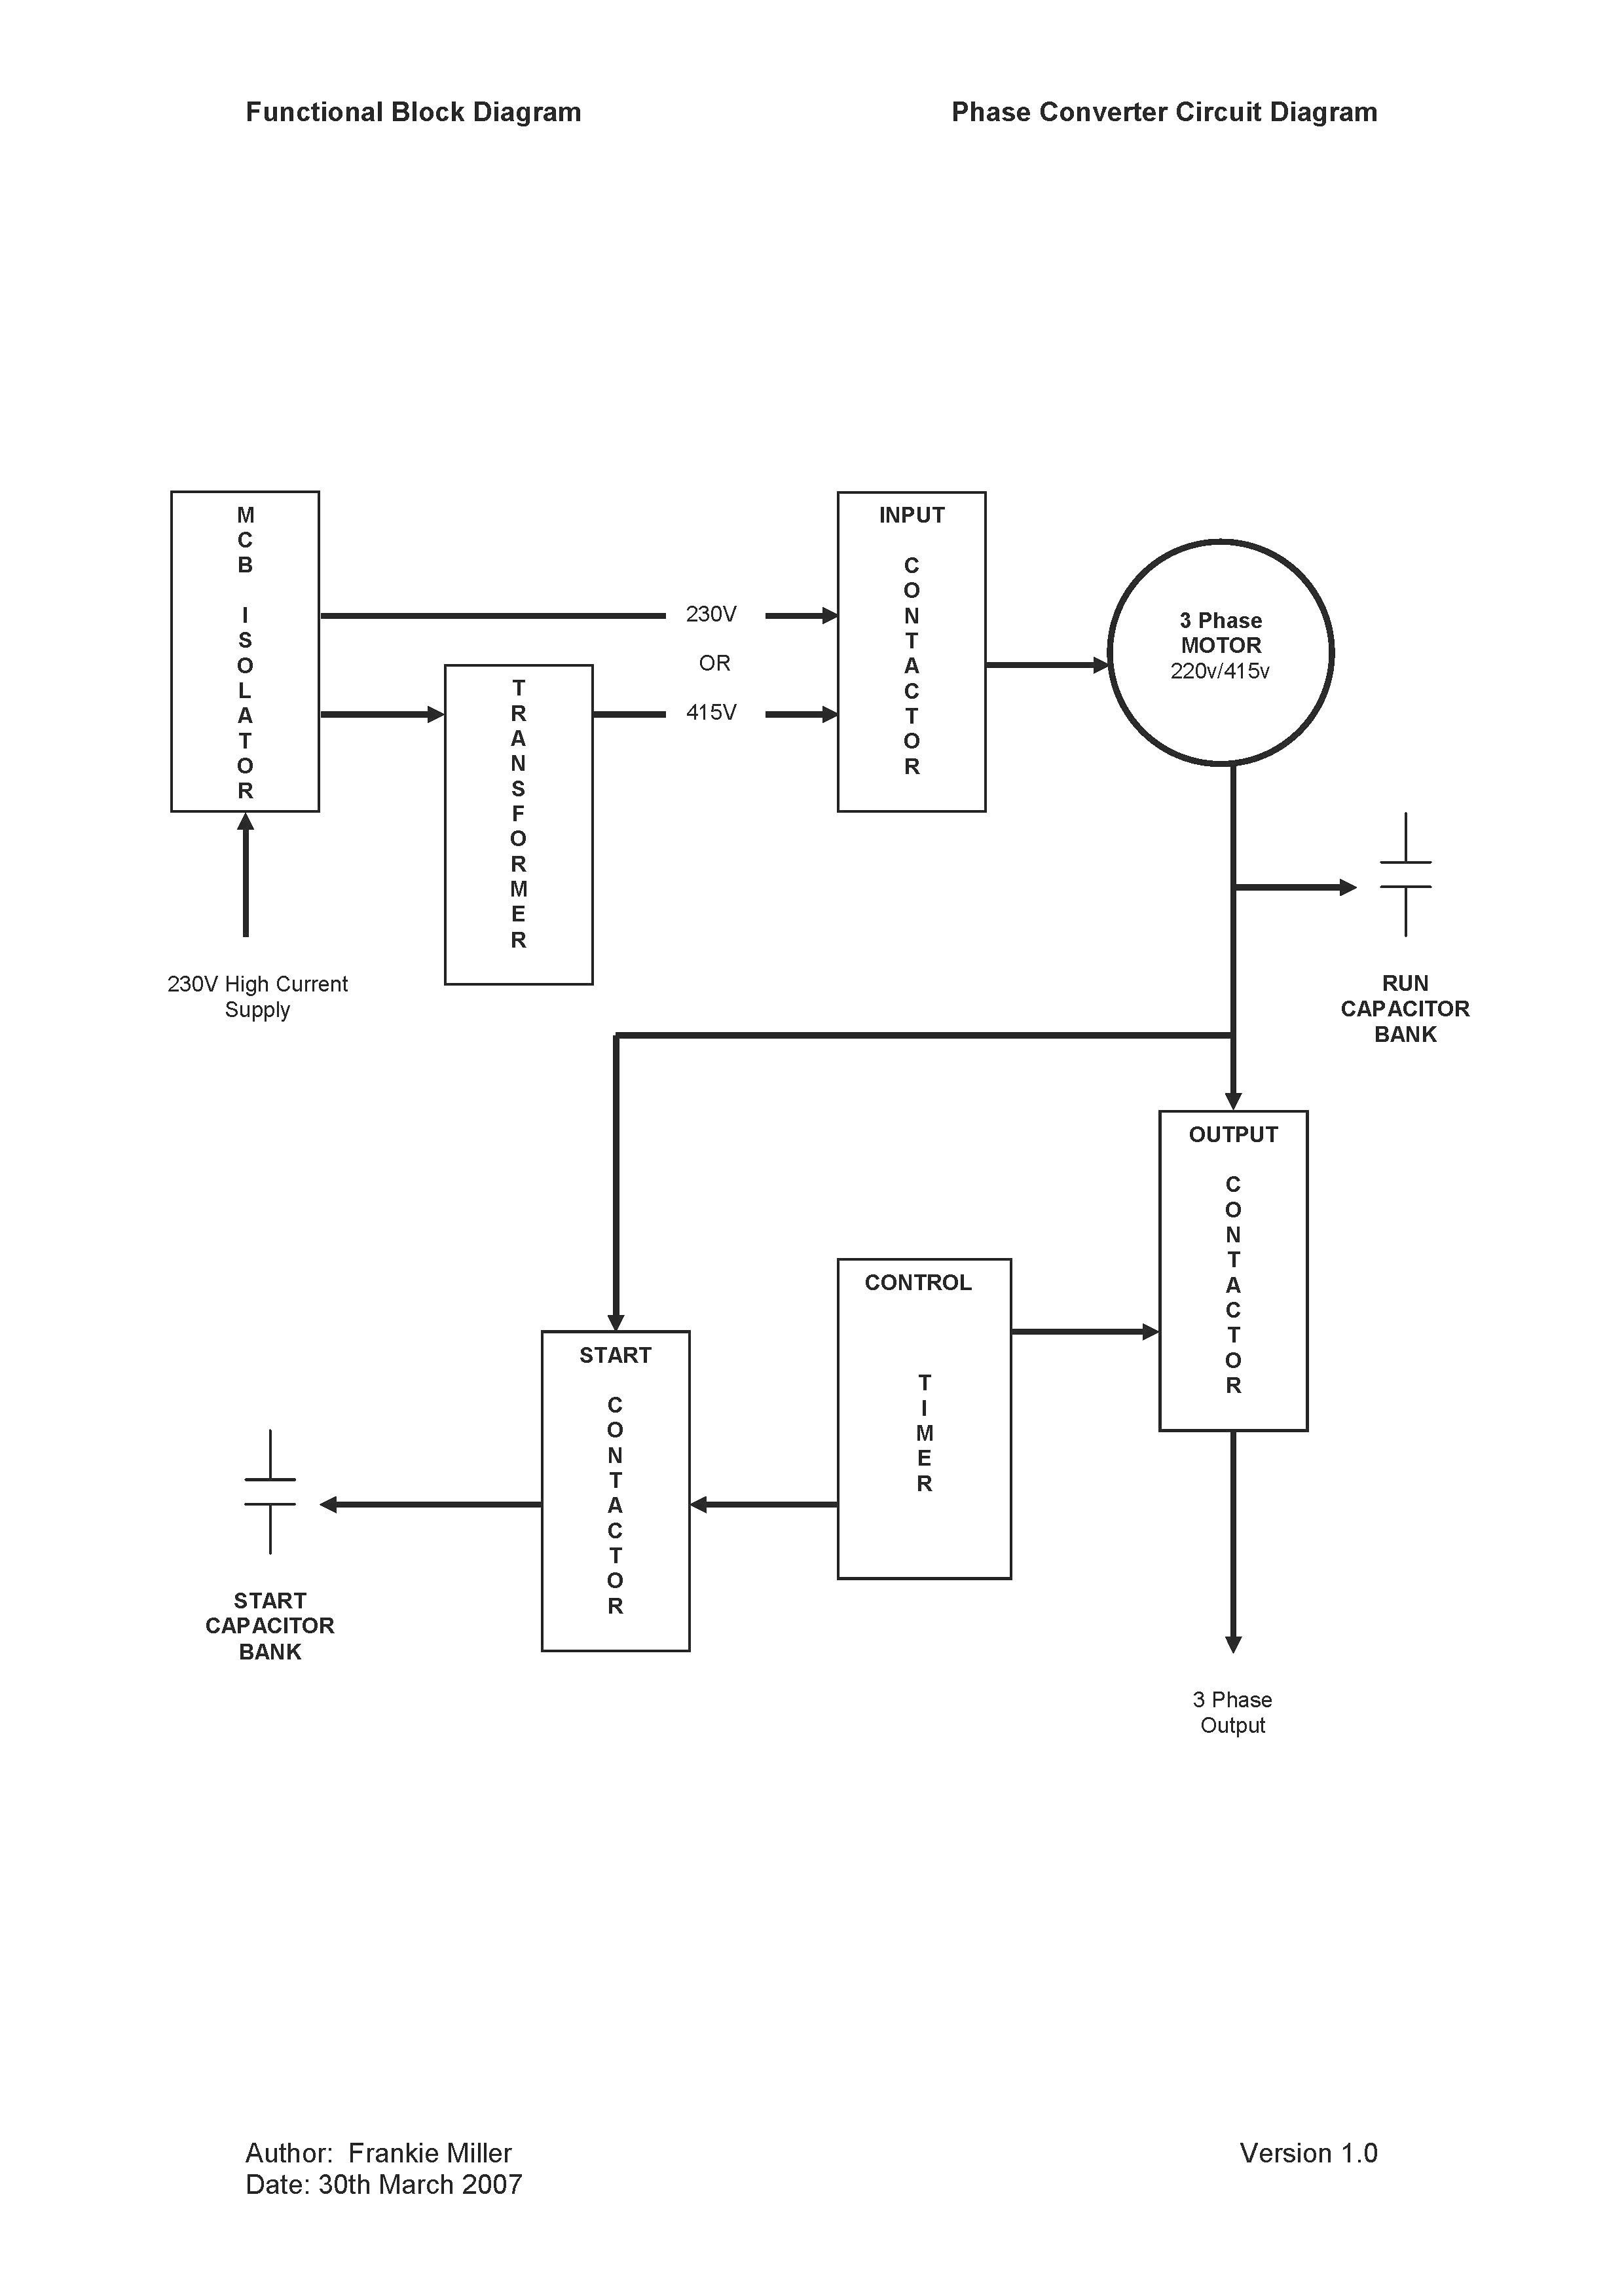 Phoenix Phase Converter Wiring Diagram   Free Wiring Diagram on add a phase wiring diagram, 240 single phase wiring diagram, single phase transformer diagram, rotary switch wiring diagram, rotary phase converter theory, single phase compressor wiring diagram, 3 phase outlet wiring diagram, acme 3 phase transformer connection diagram, rotary phase converter capacitor, 2004 mazda rx-8 spark plug diagram, 3 phase power wiring diagram, 3 phase converter diagram, rotary phase converter installation, 3 phase motor connection diagram, rotary vs. static phase converter, three phase wiring diagram, 3 phase motor circuit diagram, paragon timer diagram, 200 amp service panel diagram, static phase converter diagram,